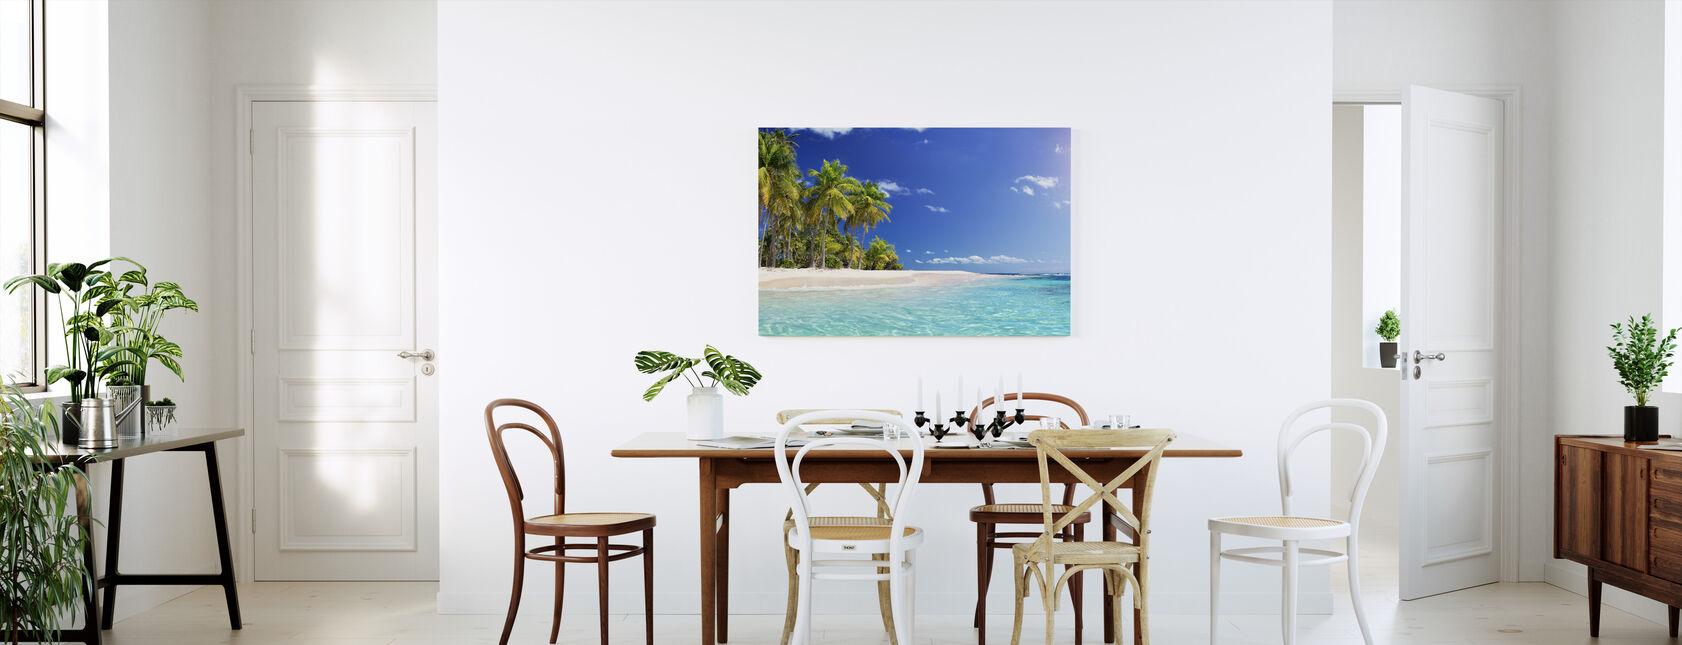 Palm Tree Beach - Canvas print - Kitchen